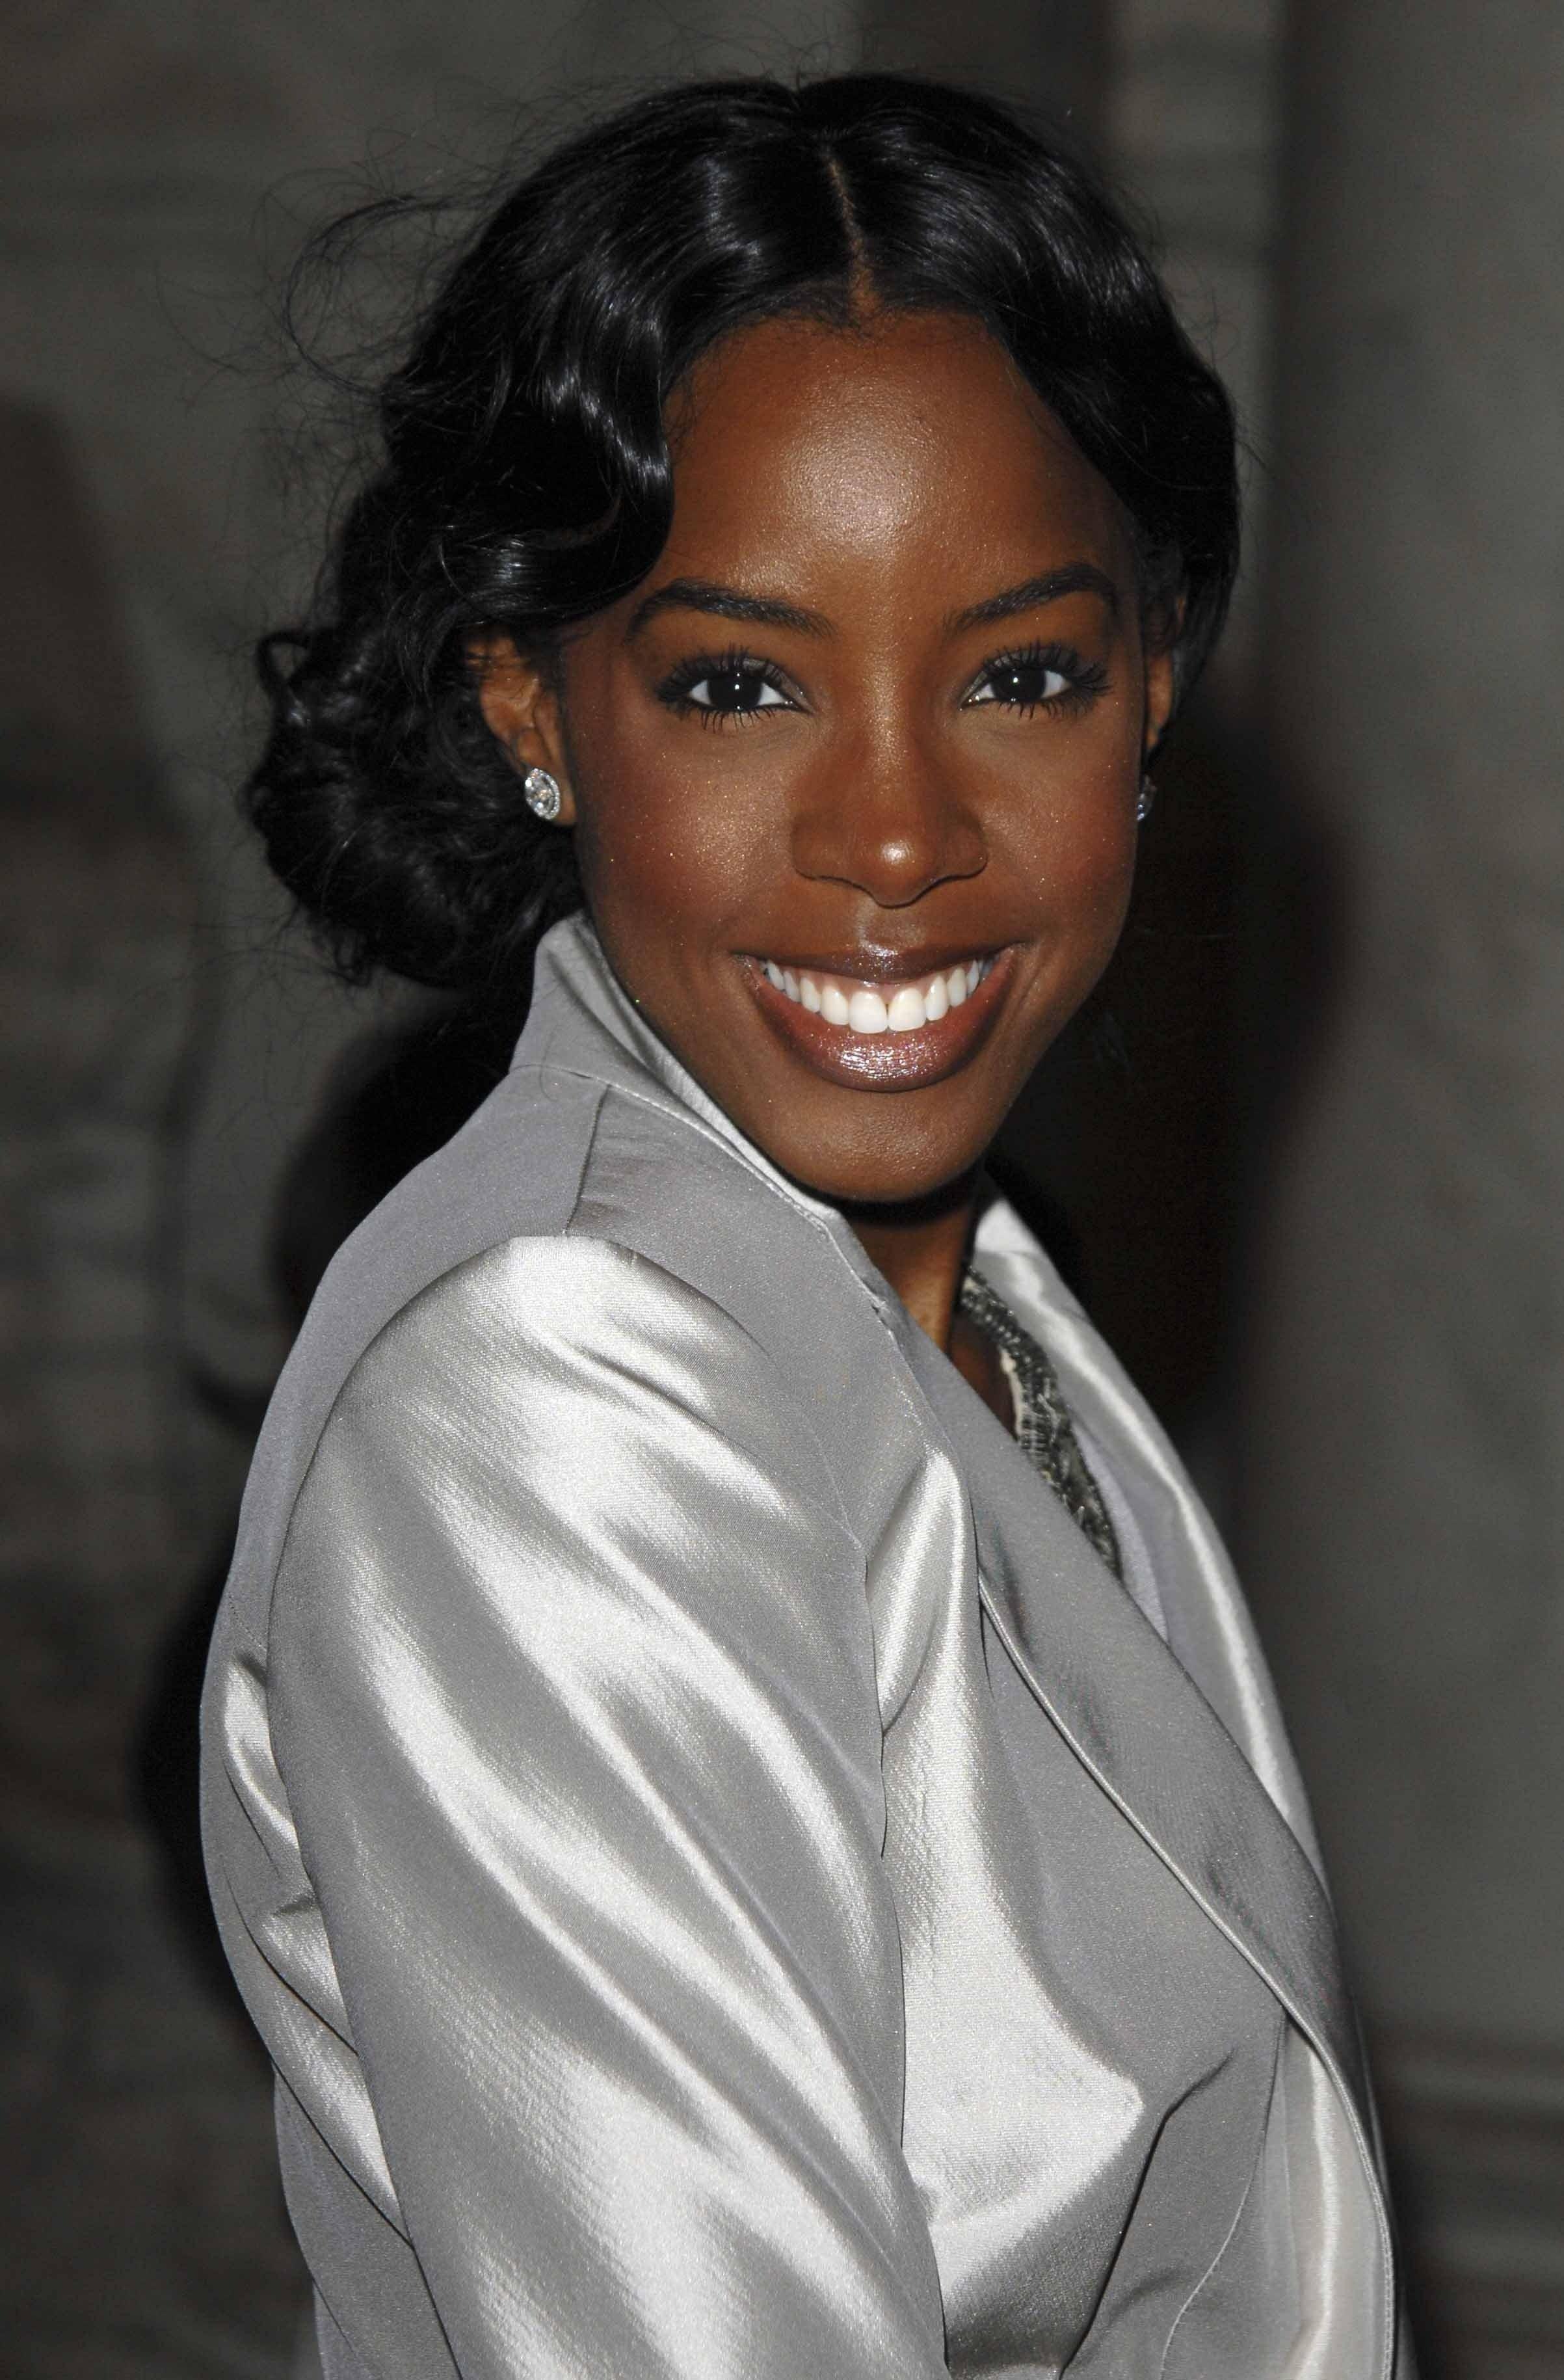 Kelly Rowland smiling wearing a silver blazer